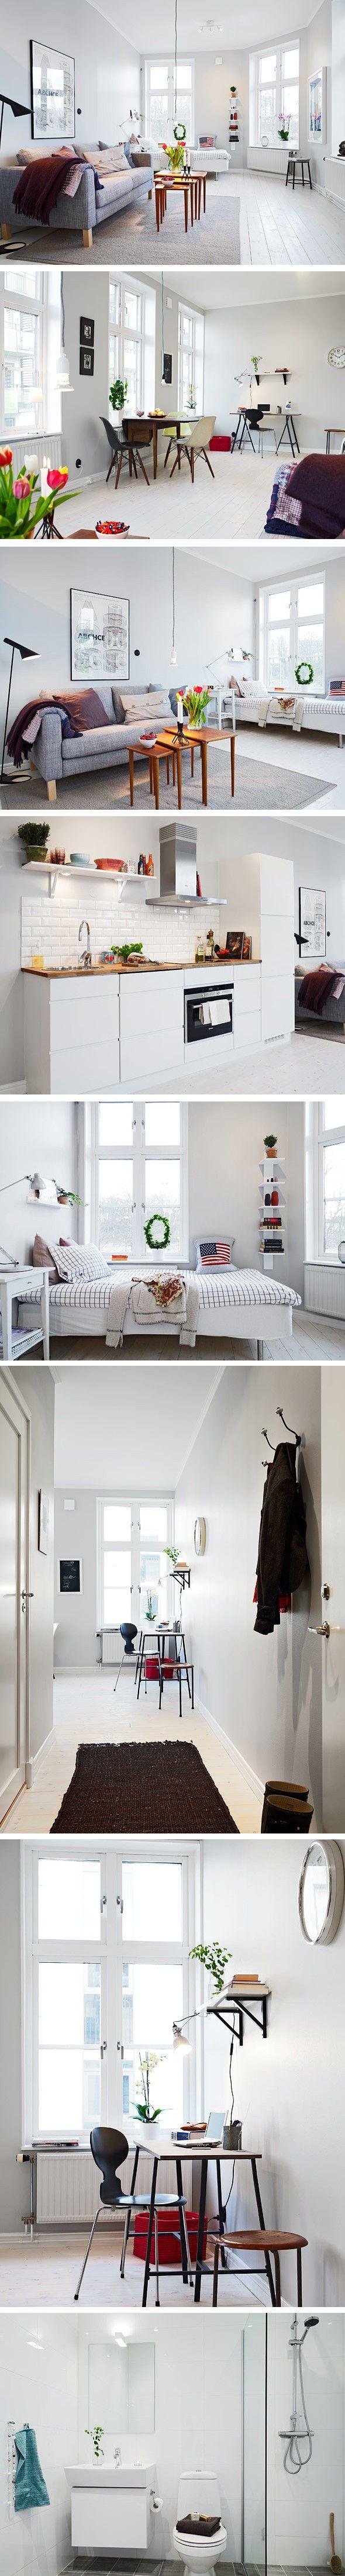 http://www.journal-du-design.fr/design/petit-appartement-a-goteborg-suede-24556/